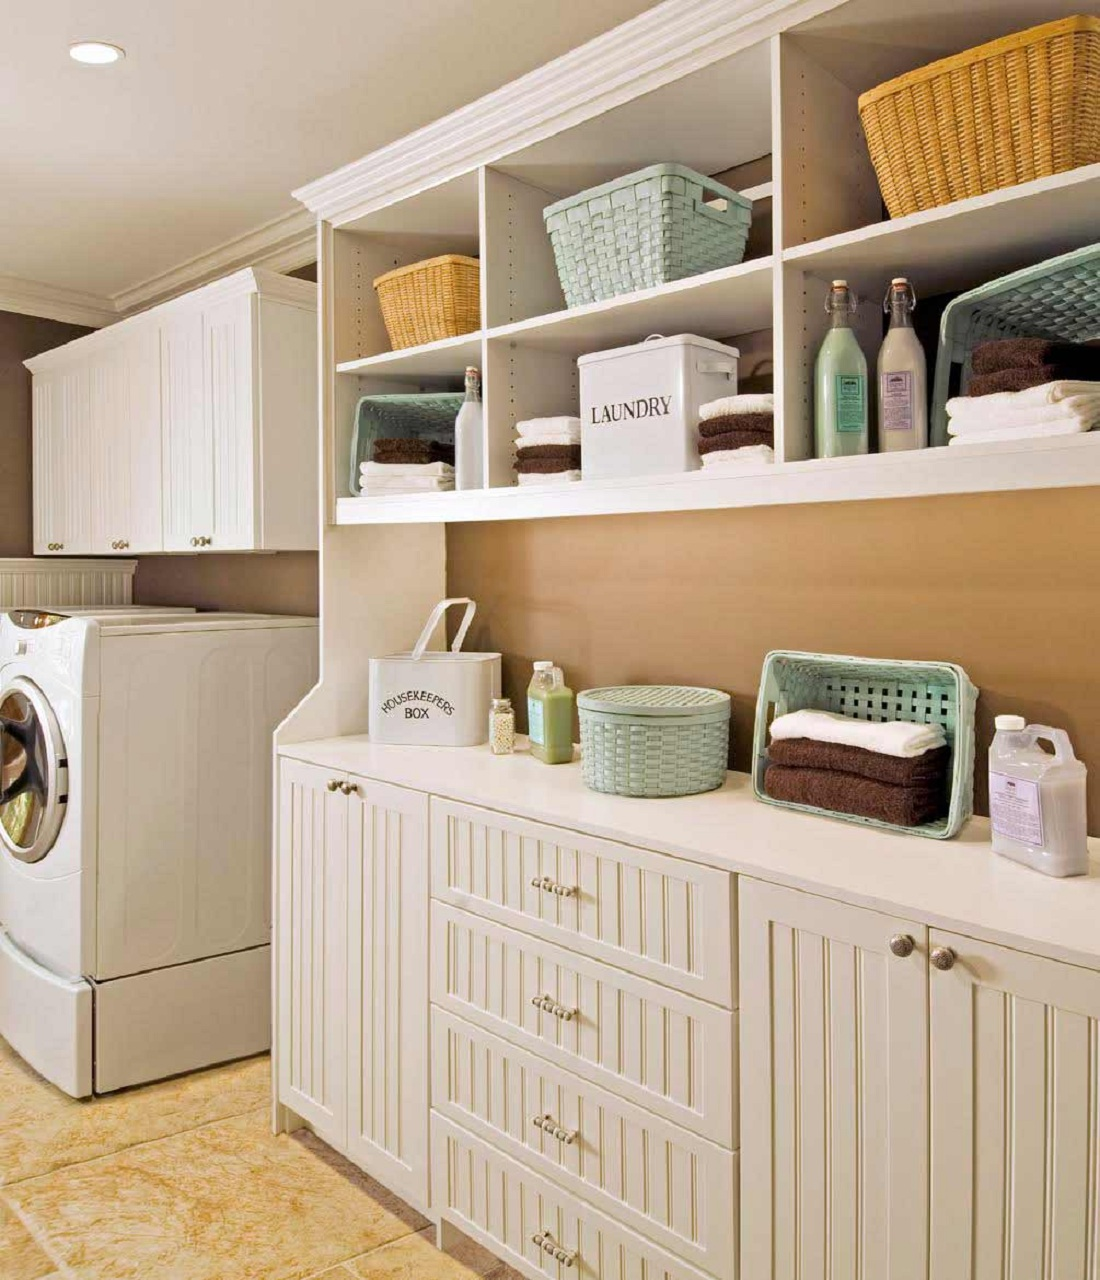 Laundry Room Storage Shelves on Laundry Room Shelves Ideas  id=35553